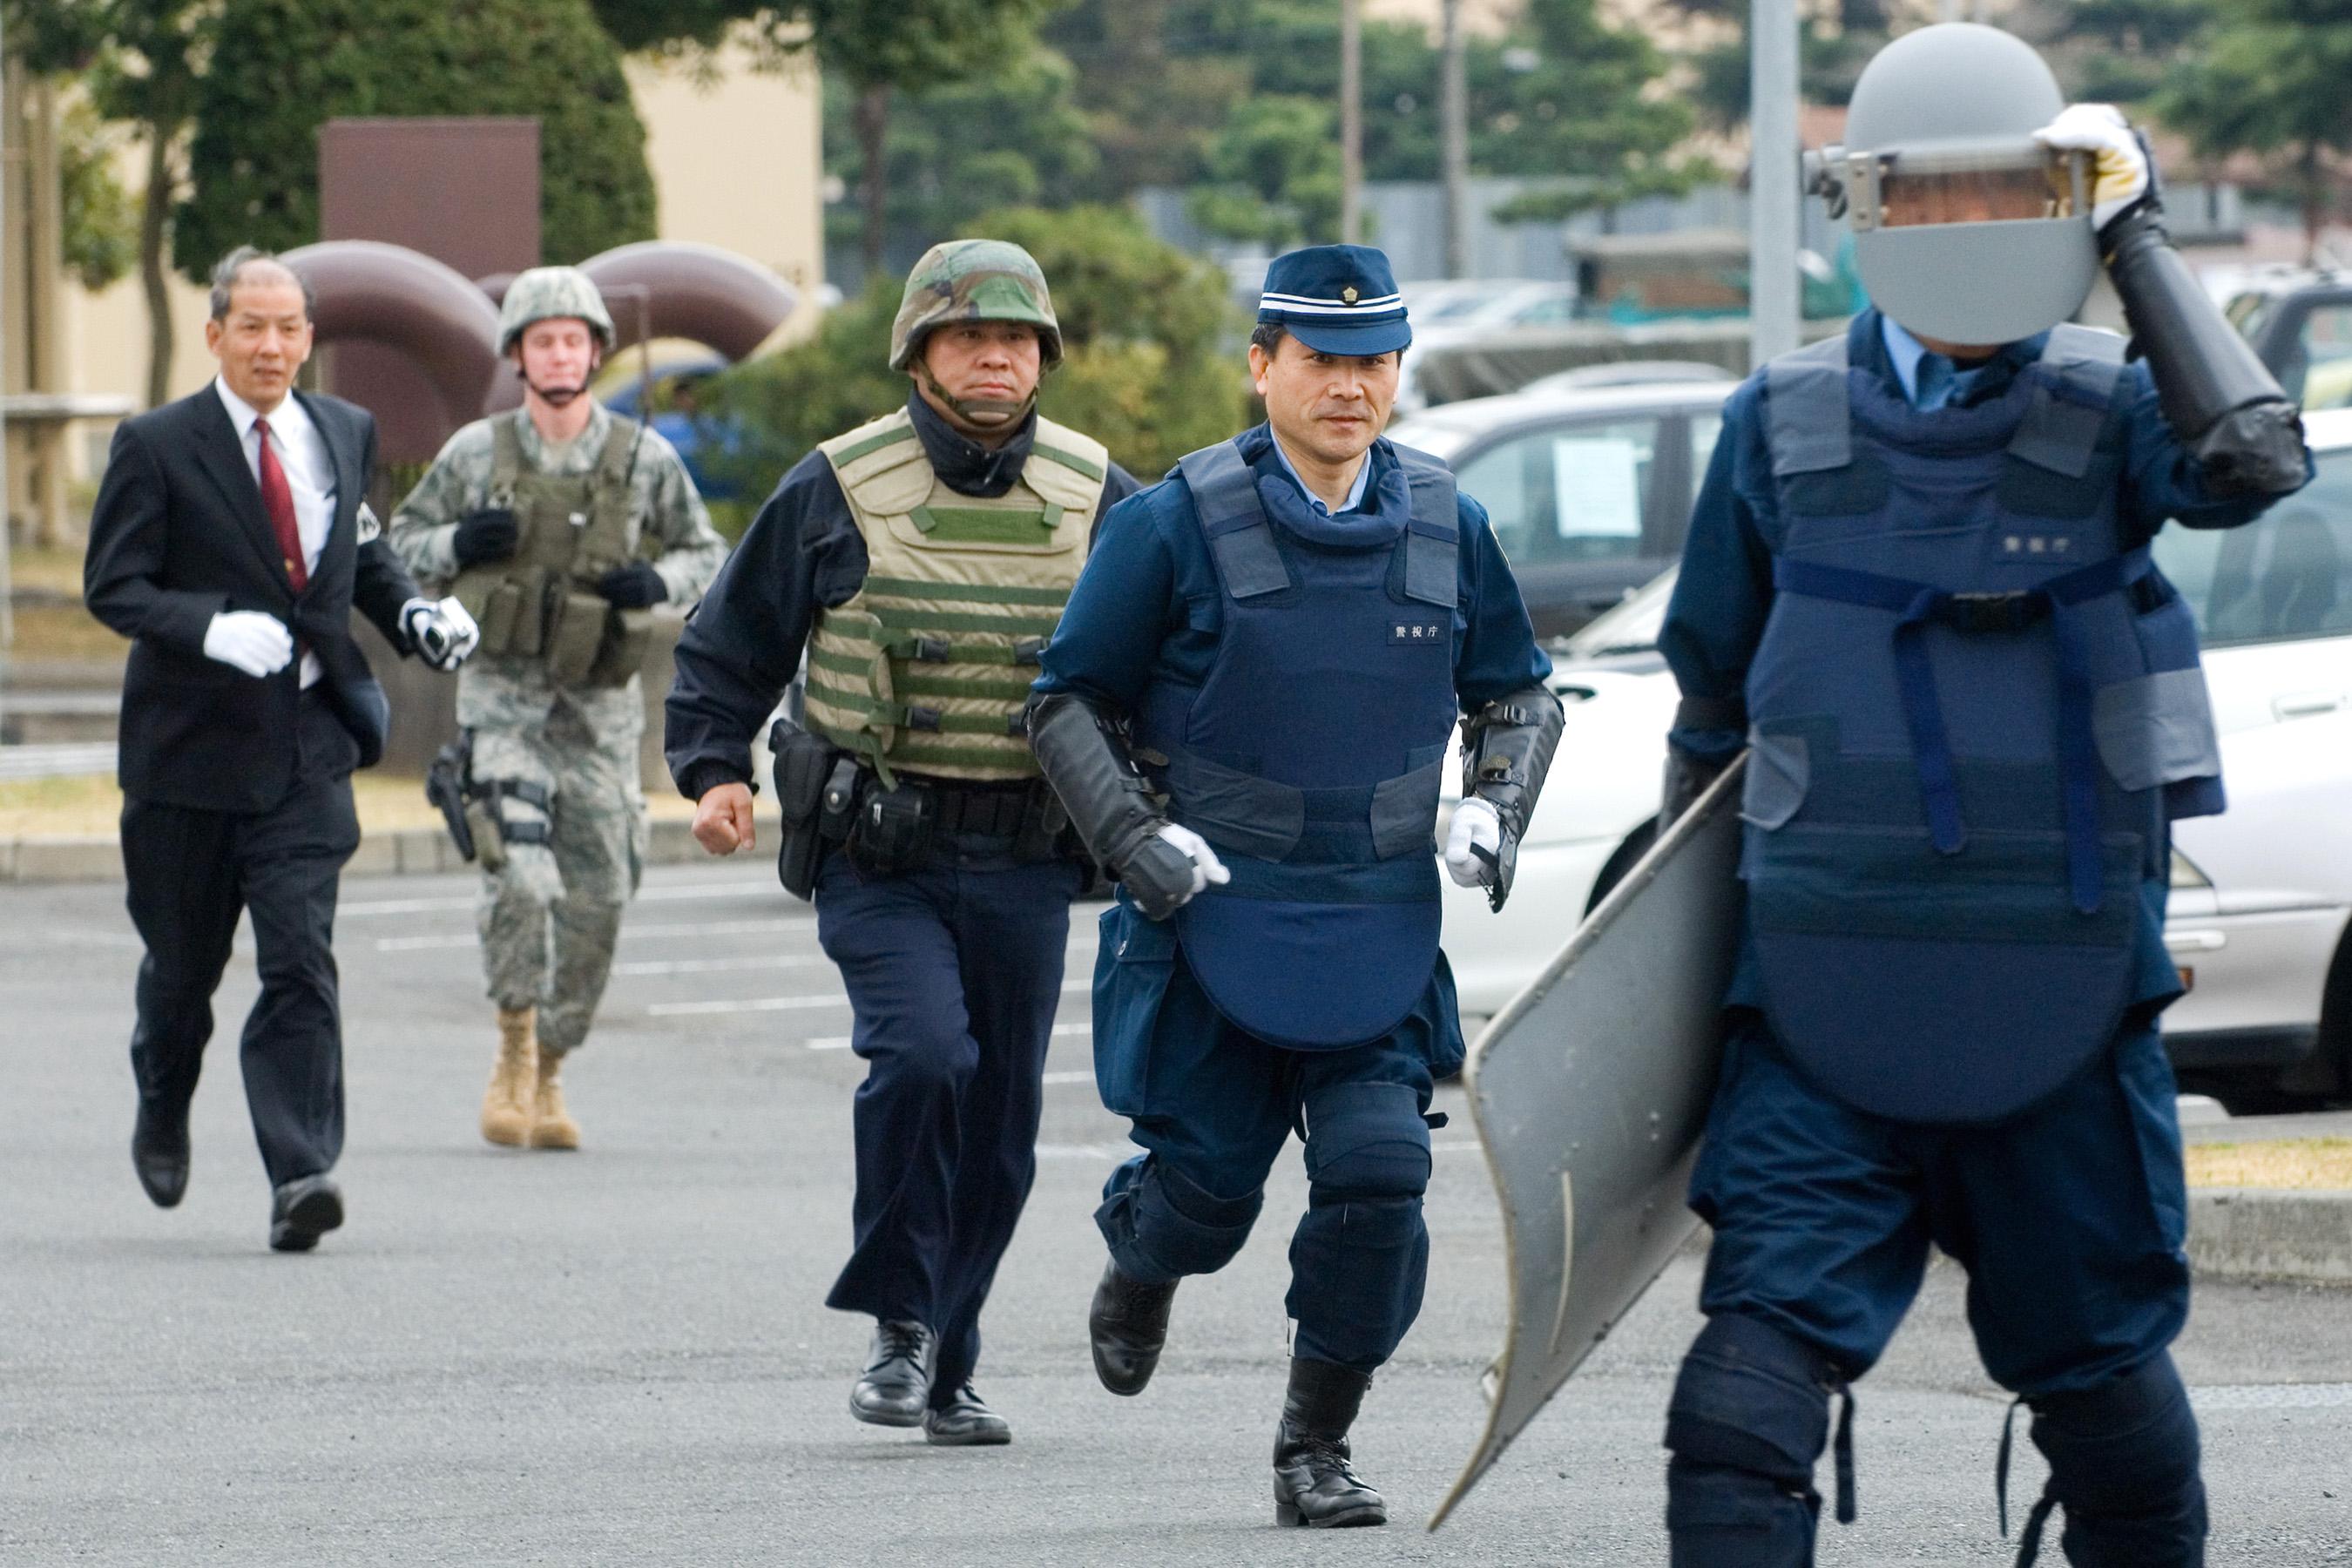 yokota airmen train with japanese police  u0026gt  u s  air force